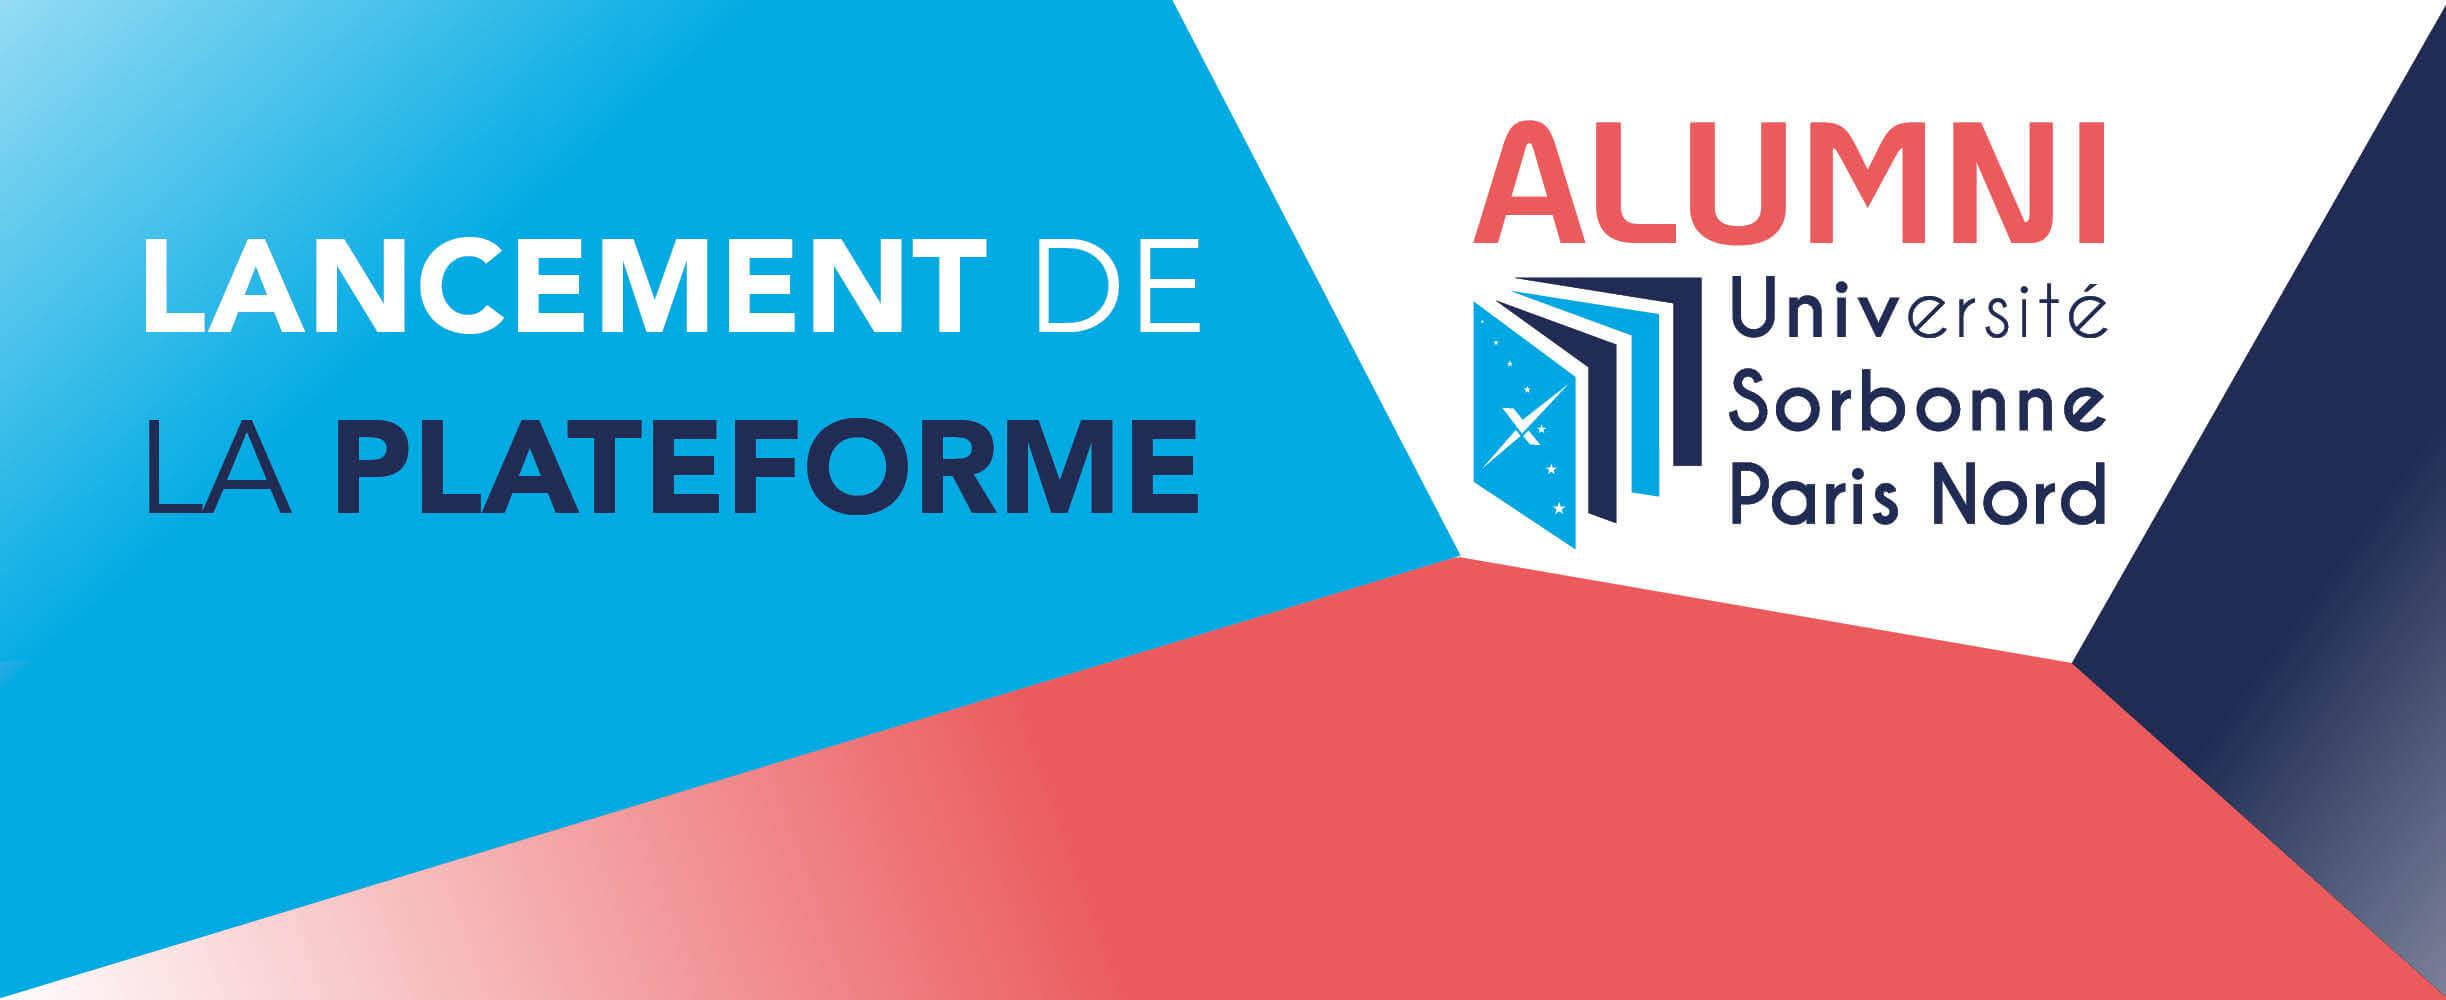 Lancement plateforme Alumni